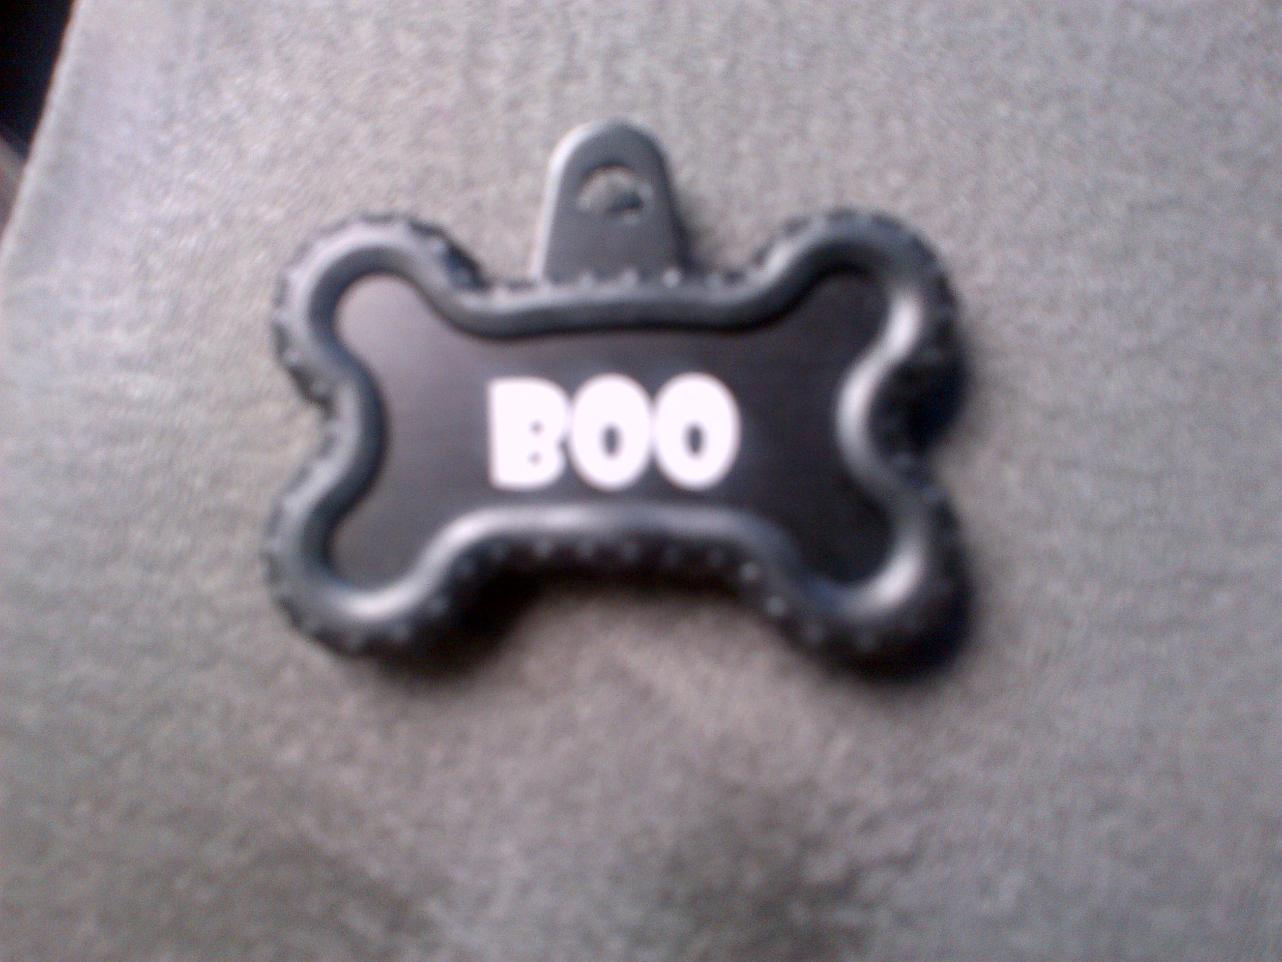 Boo Pics!-img-20120927-00678.jpg